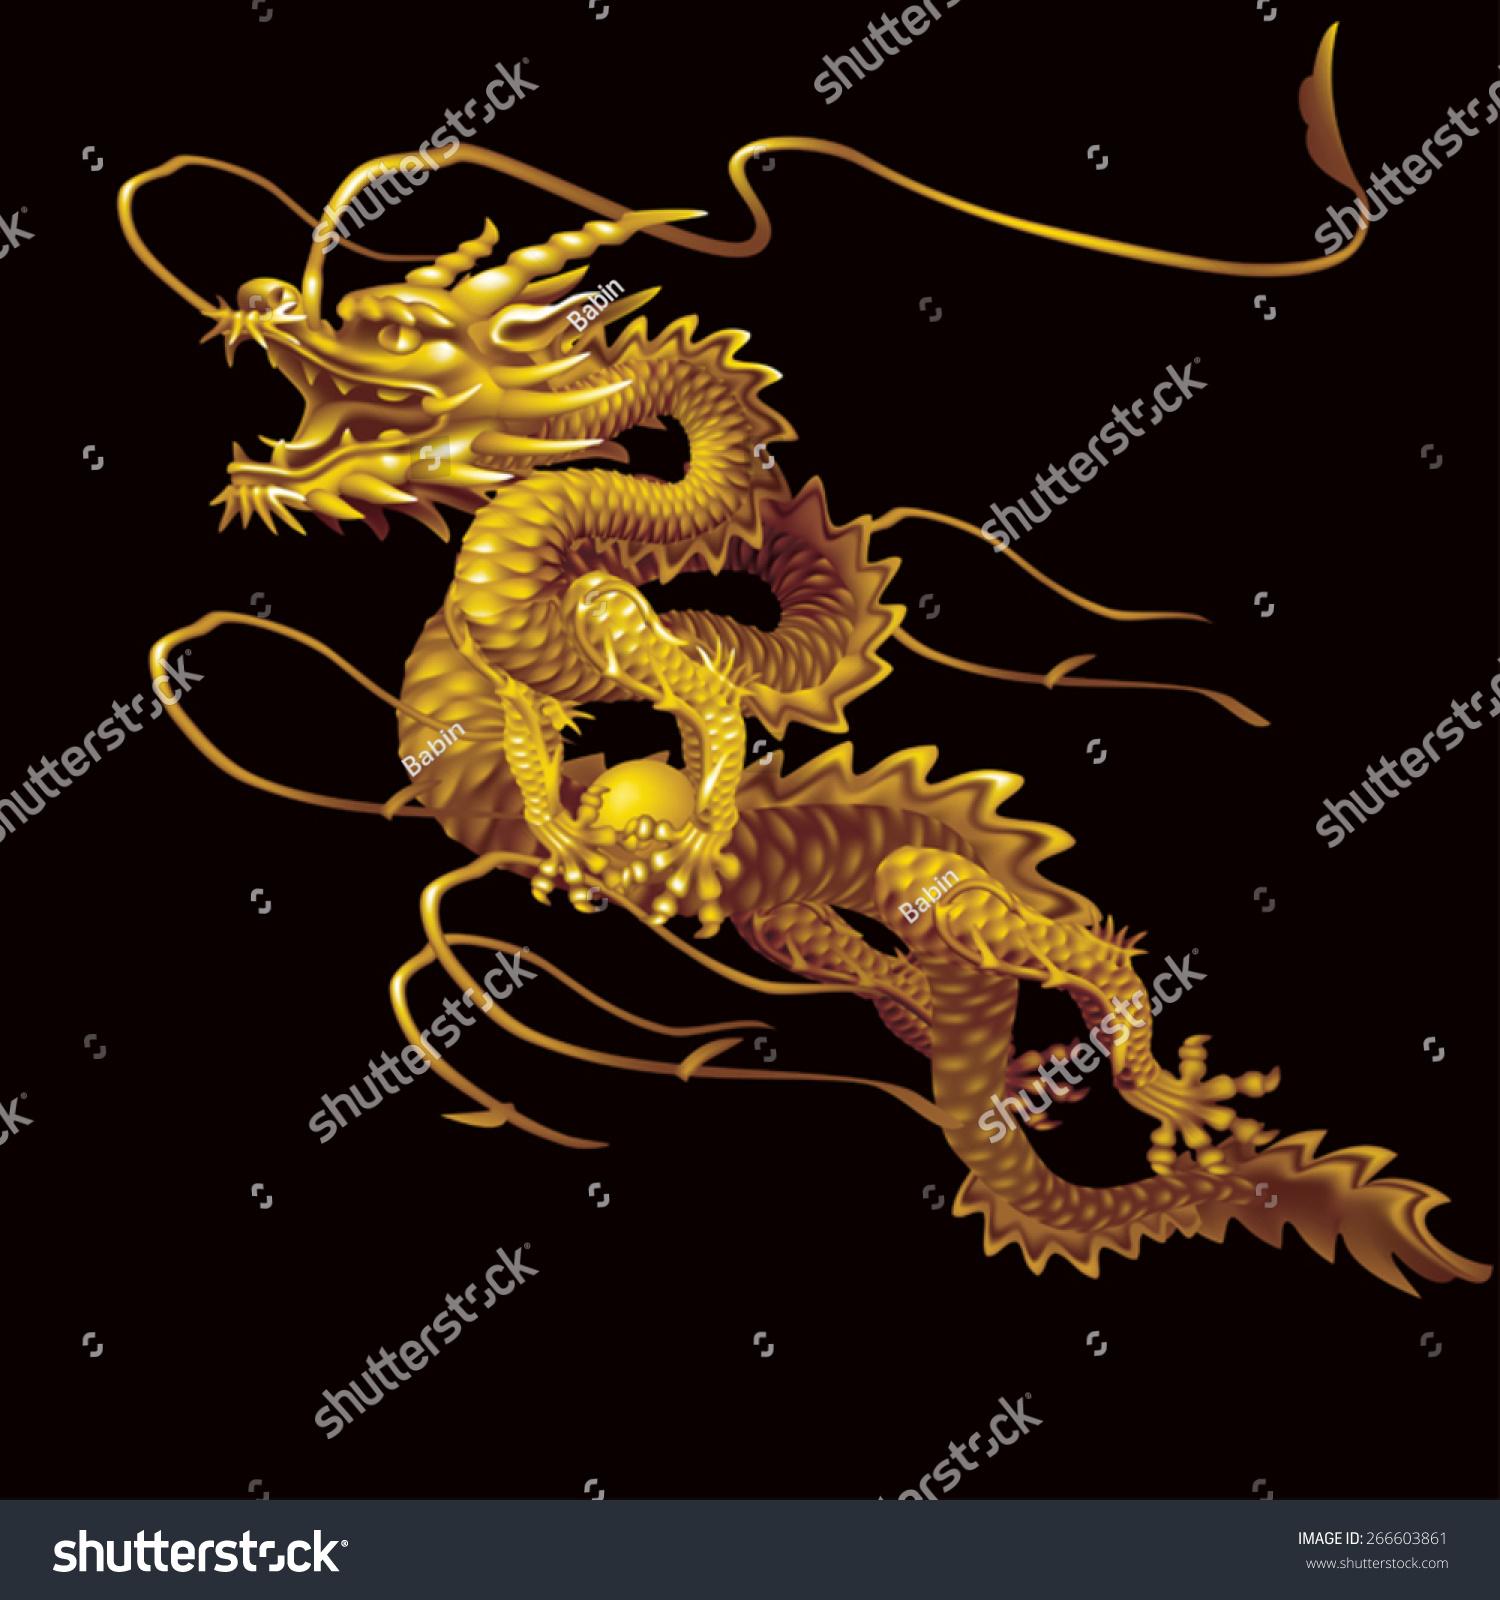 Golden Dragon moving up diagonally on a… Stock Photo 266603861